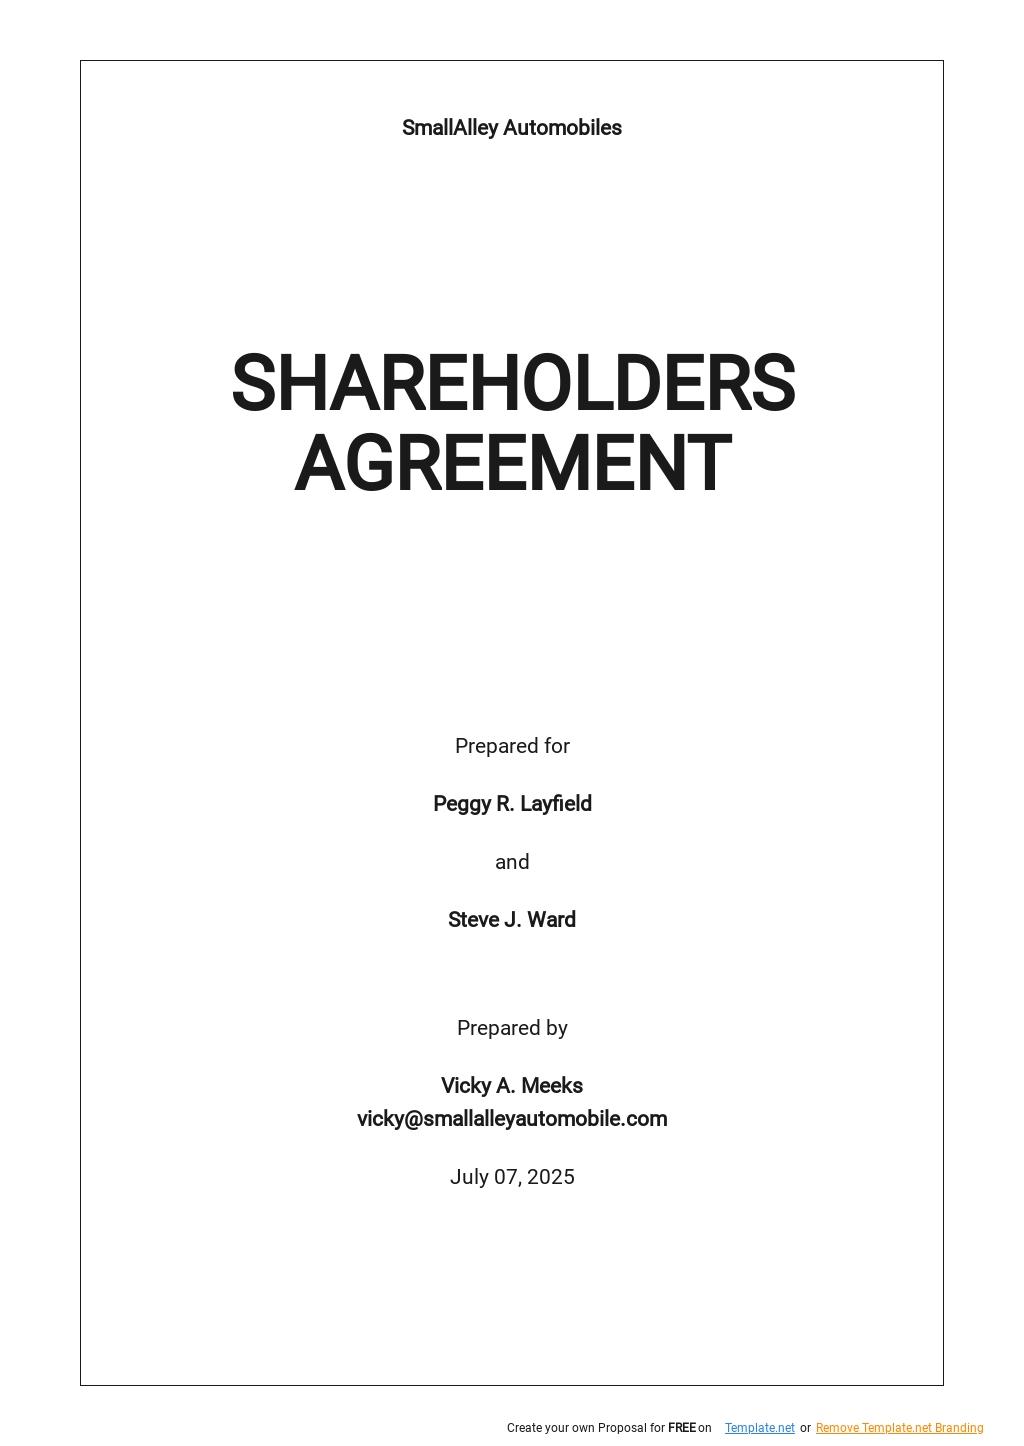 Shareholders Agreement Template.jpe